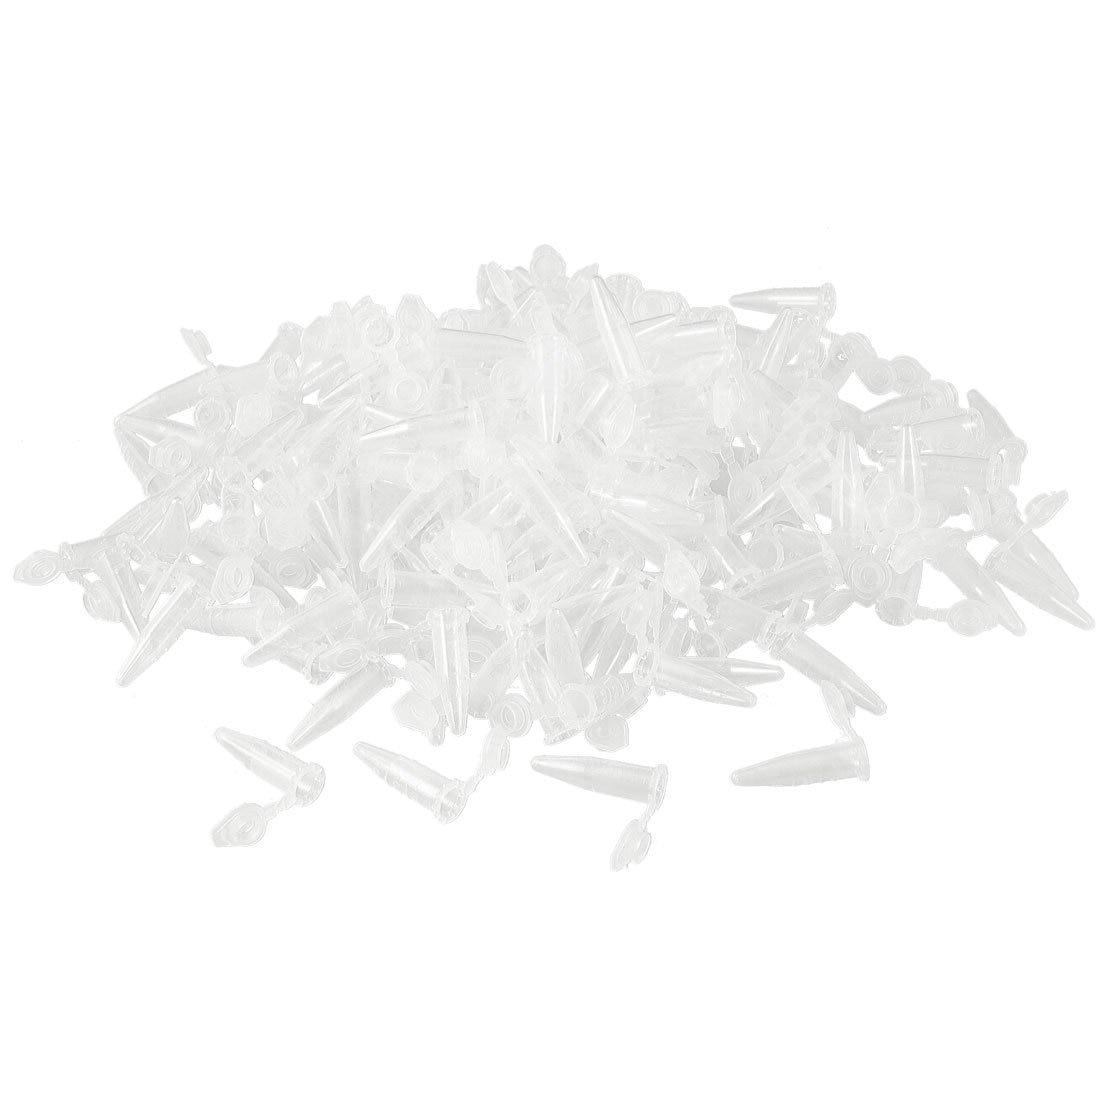 100% New 1000 Pcs Laboratory Clear White Mark Printed Plastic Centrifuge Tube 0.5ml